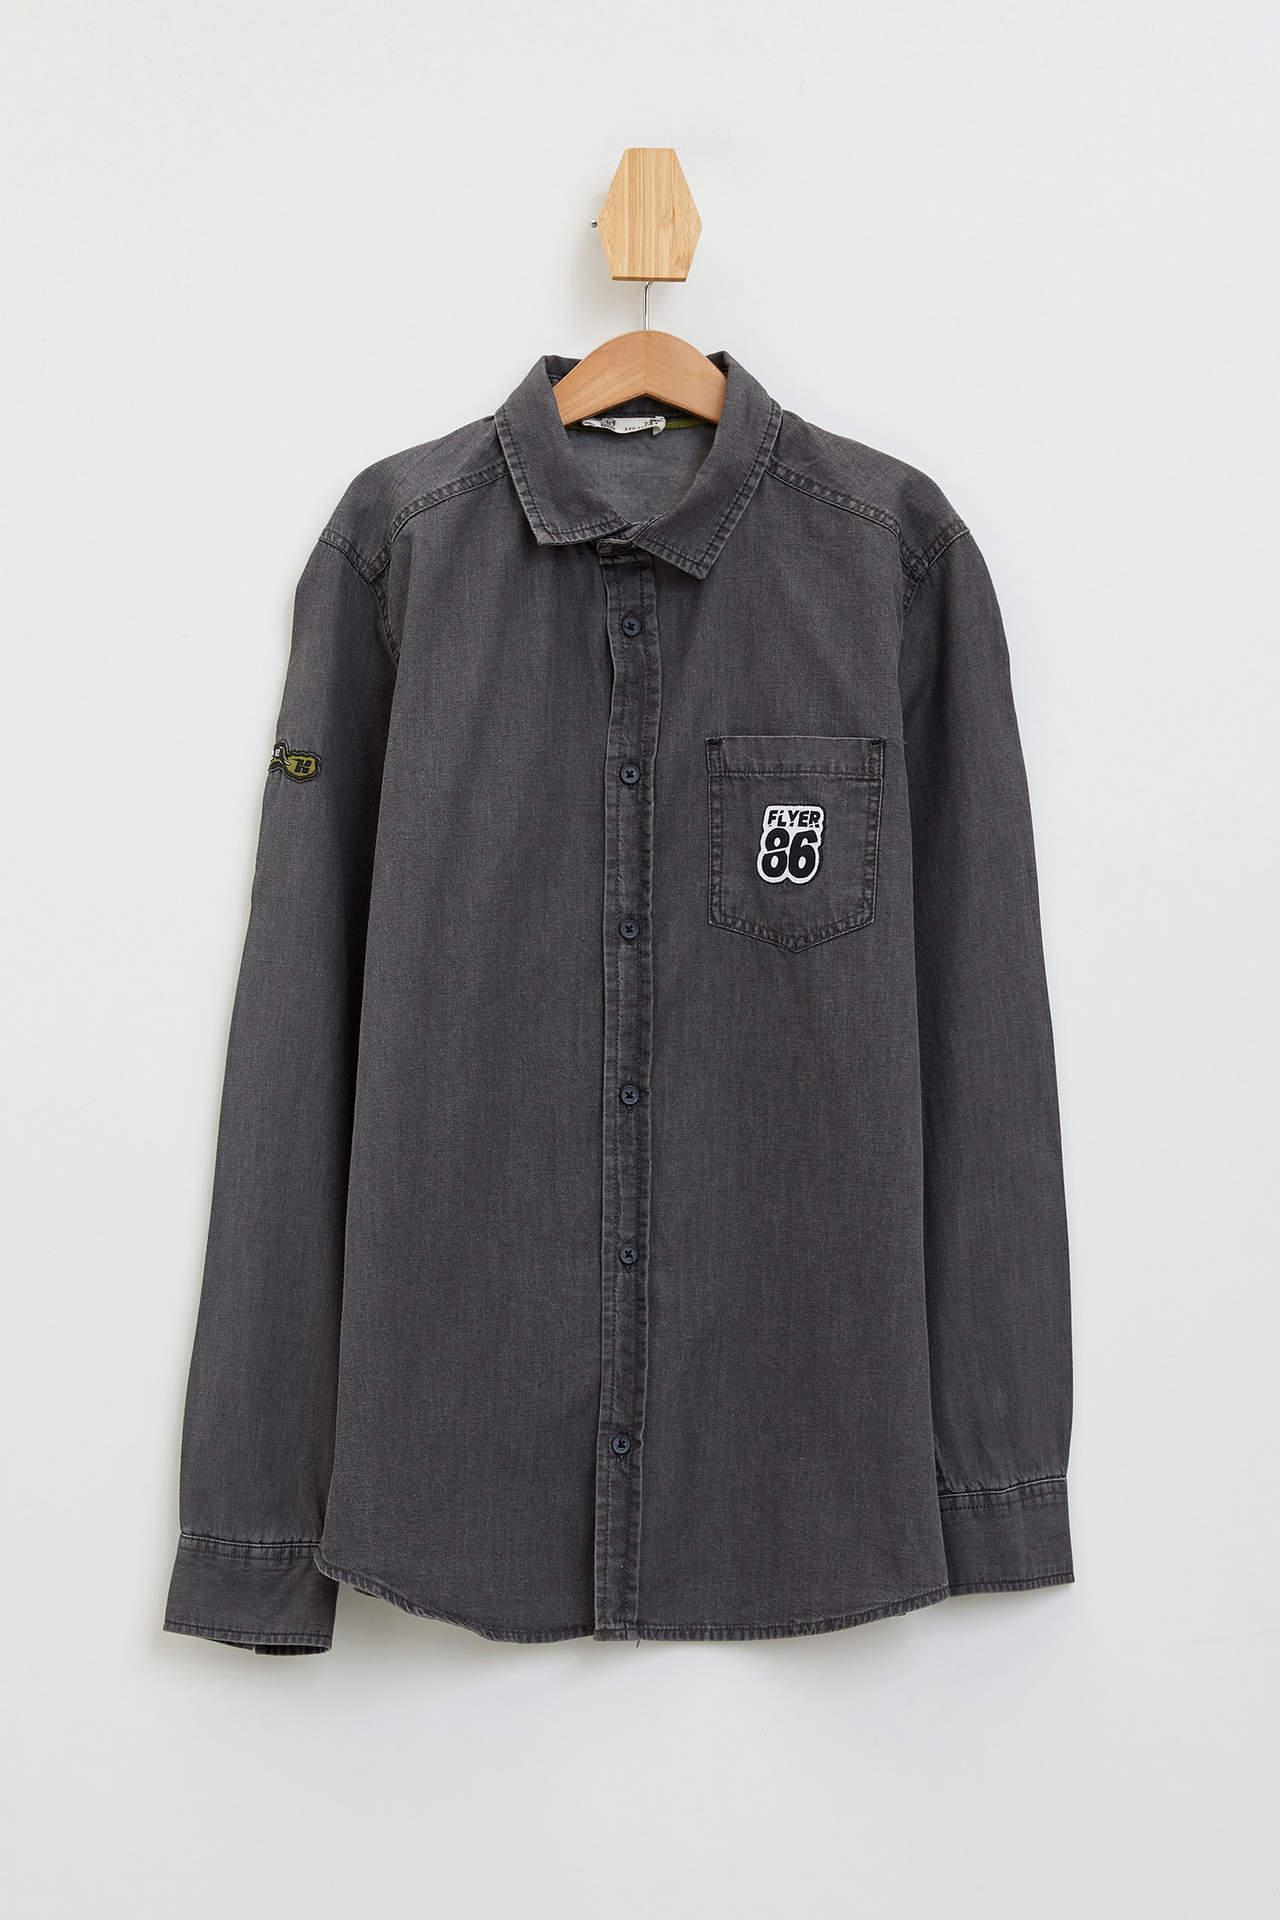 DeFacto Erkek Çocuk Patch Detaylı Uzun Kollu T-shirt Gri male